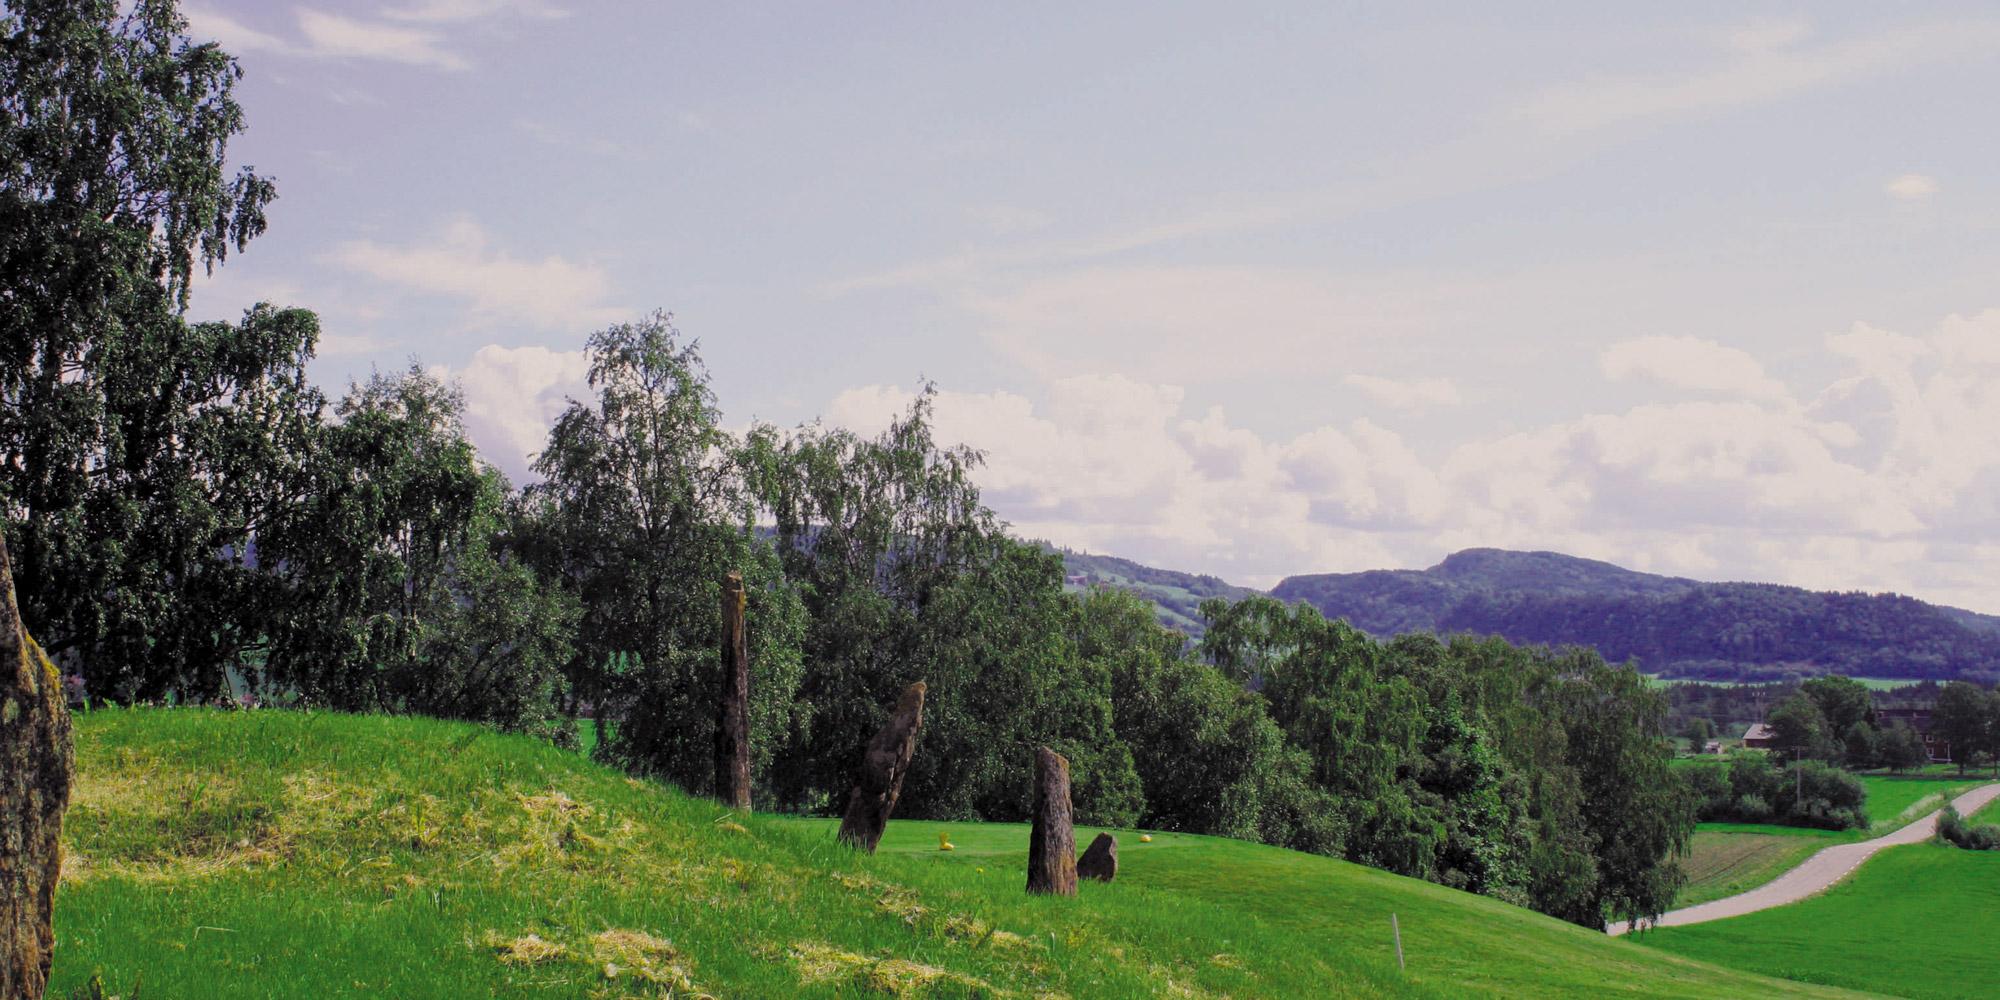 verdal-bauta-trones-2x1. Copyright: Visit Innherred